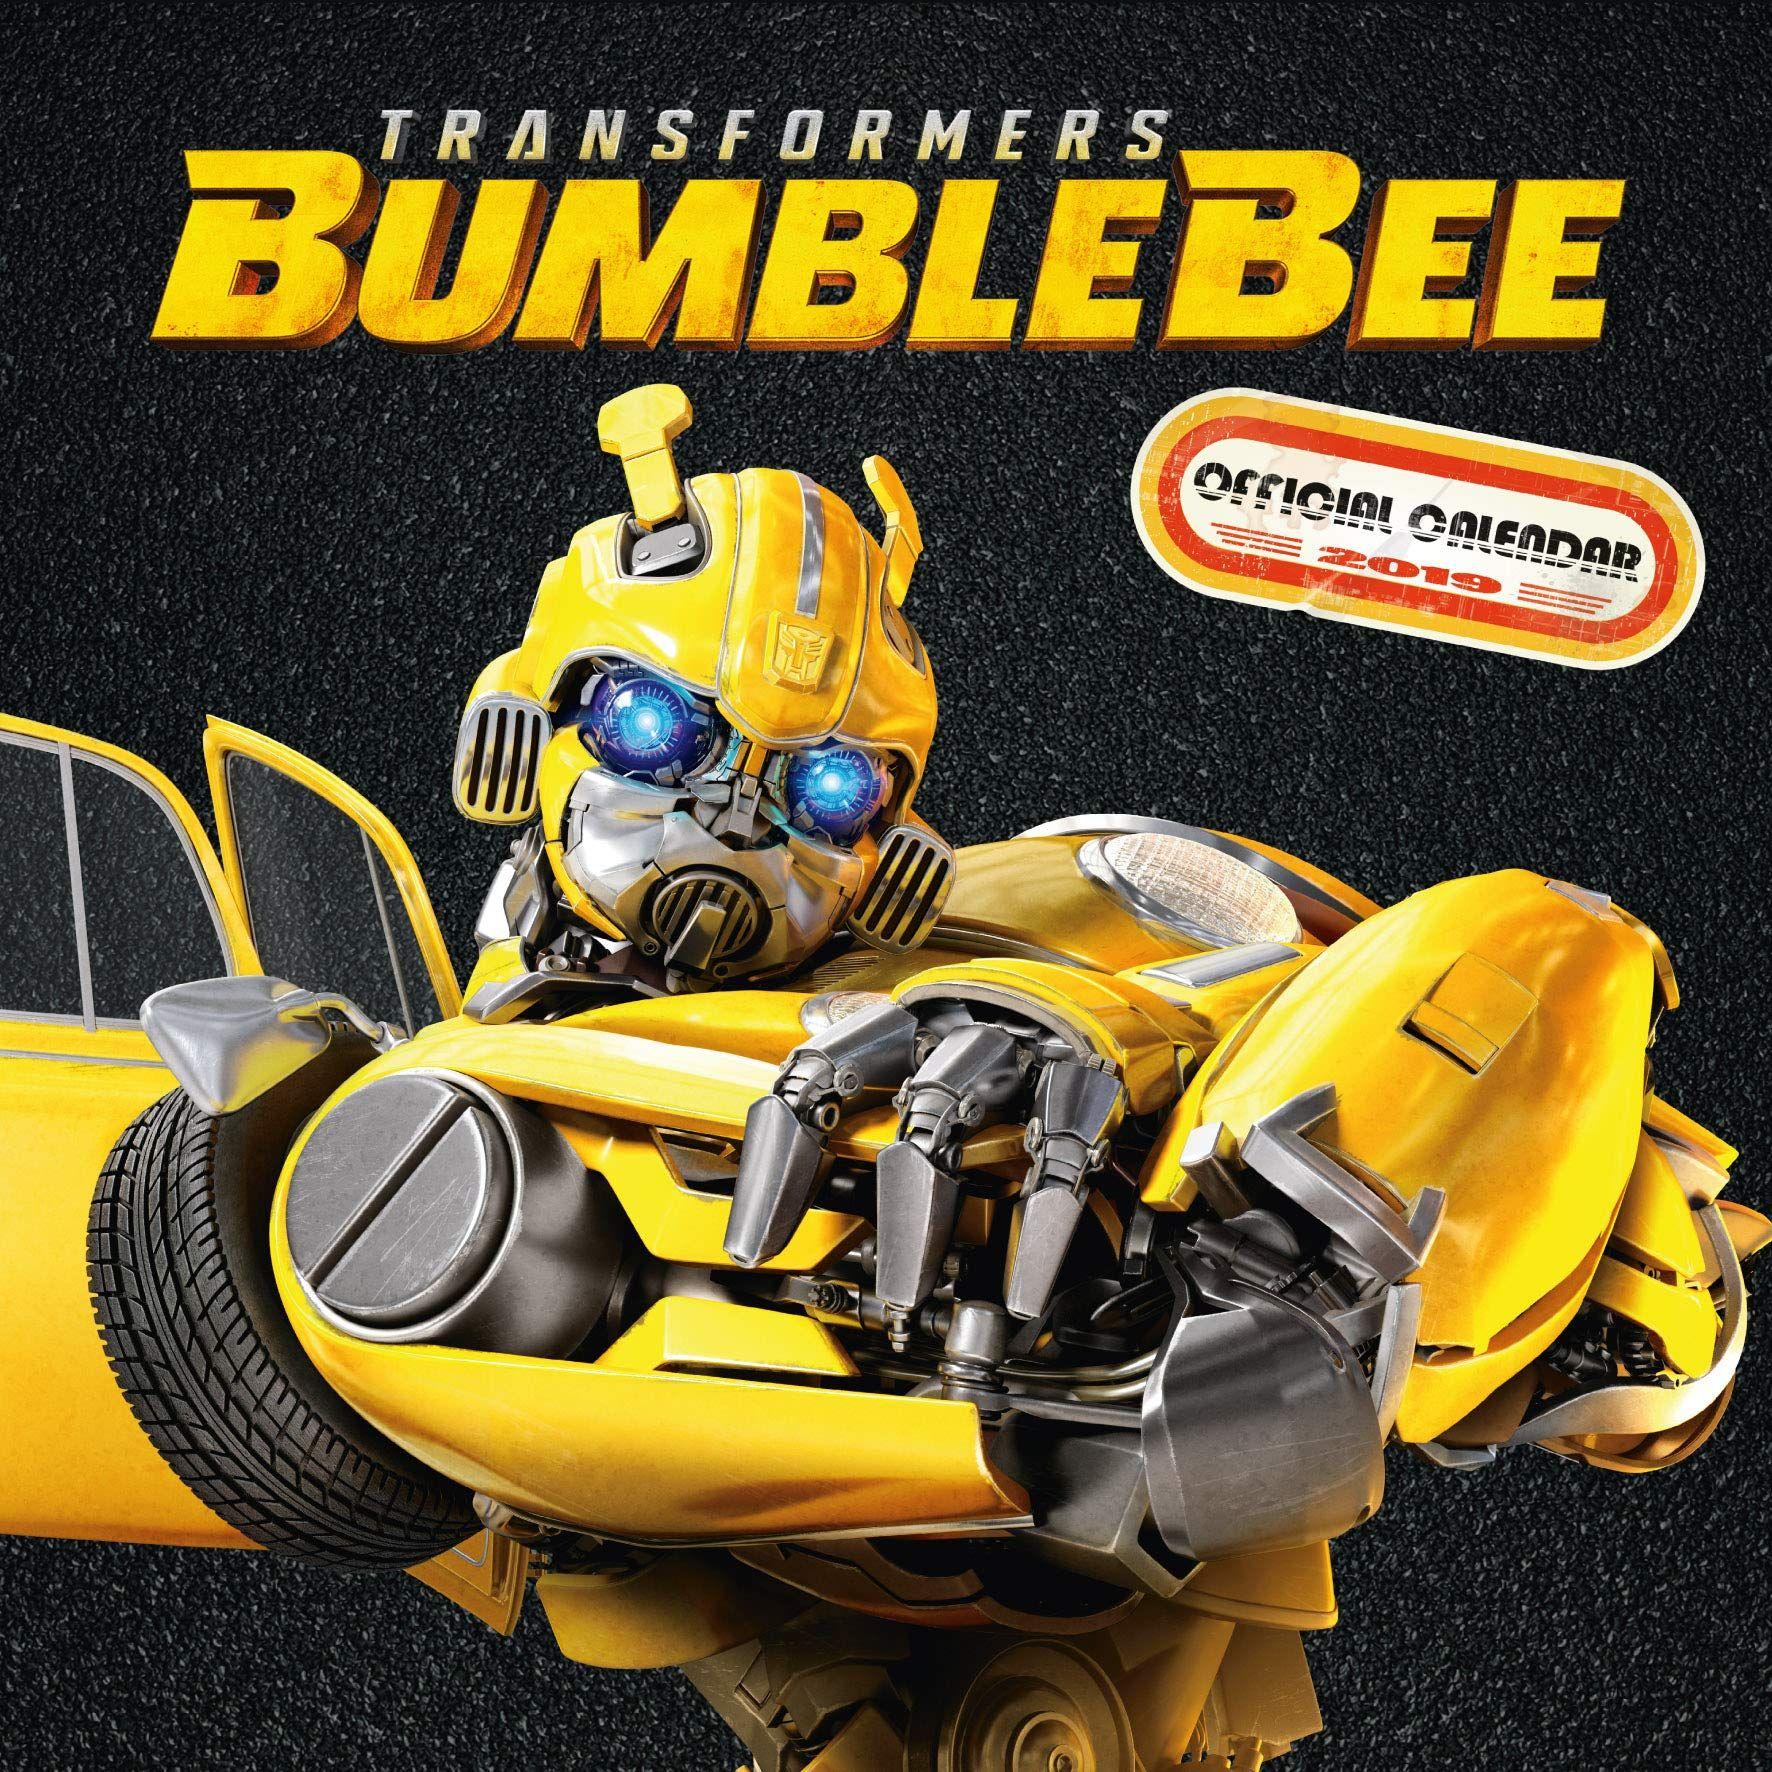 Стенен Календар Danilo 2019 - Transformers Bumblebee - 1